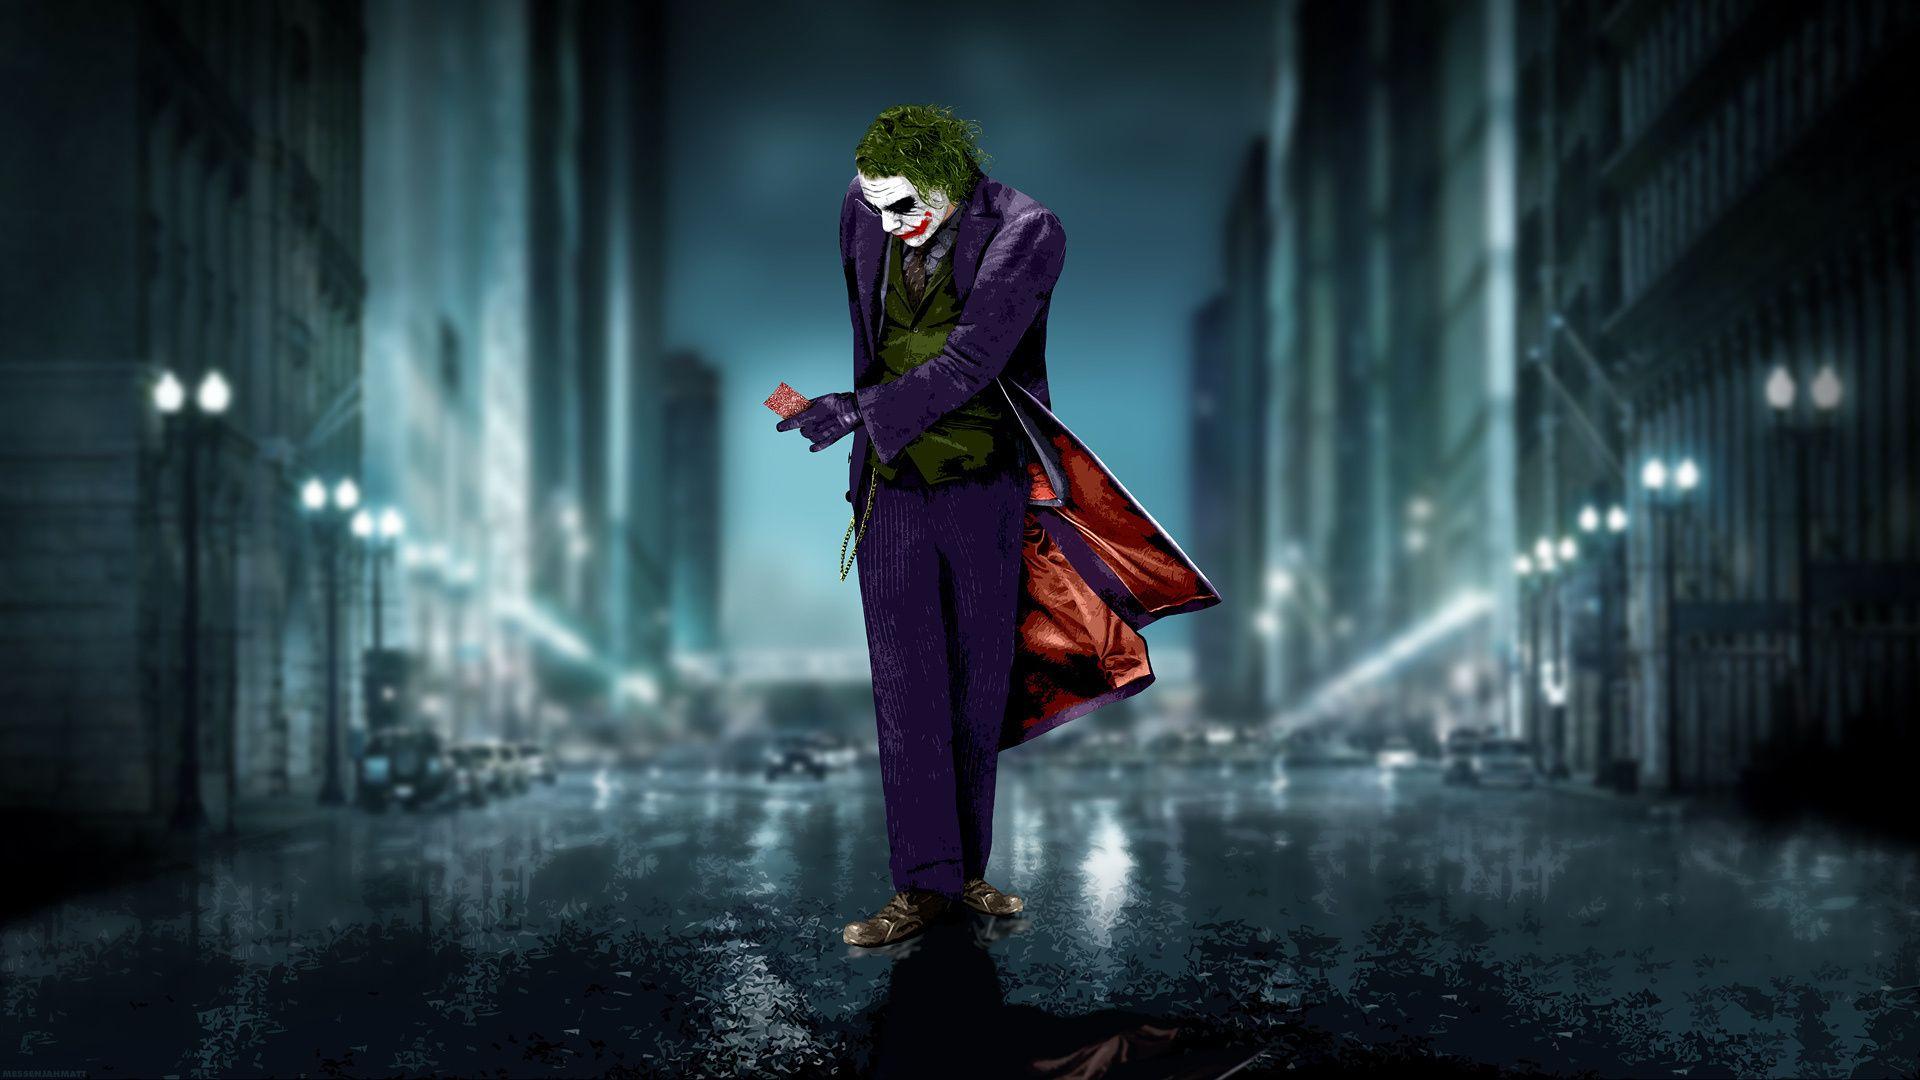 Joker Hd Wallpapers 1080p Joker Wallpapers Joker Images Joker Background